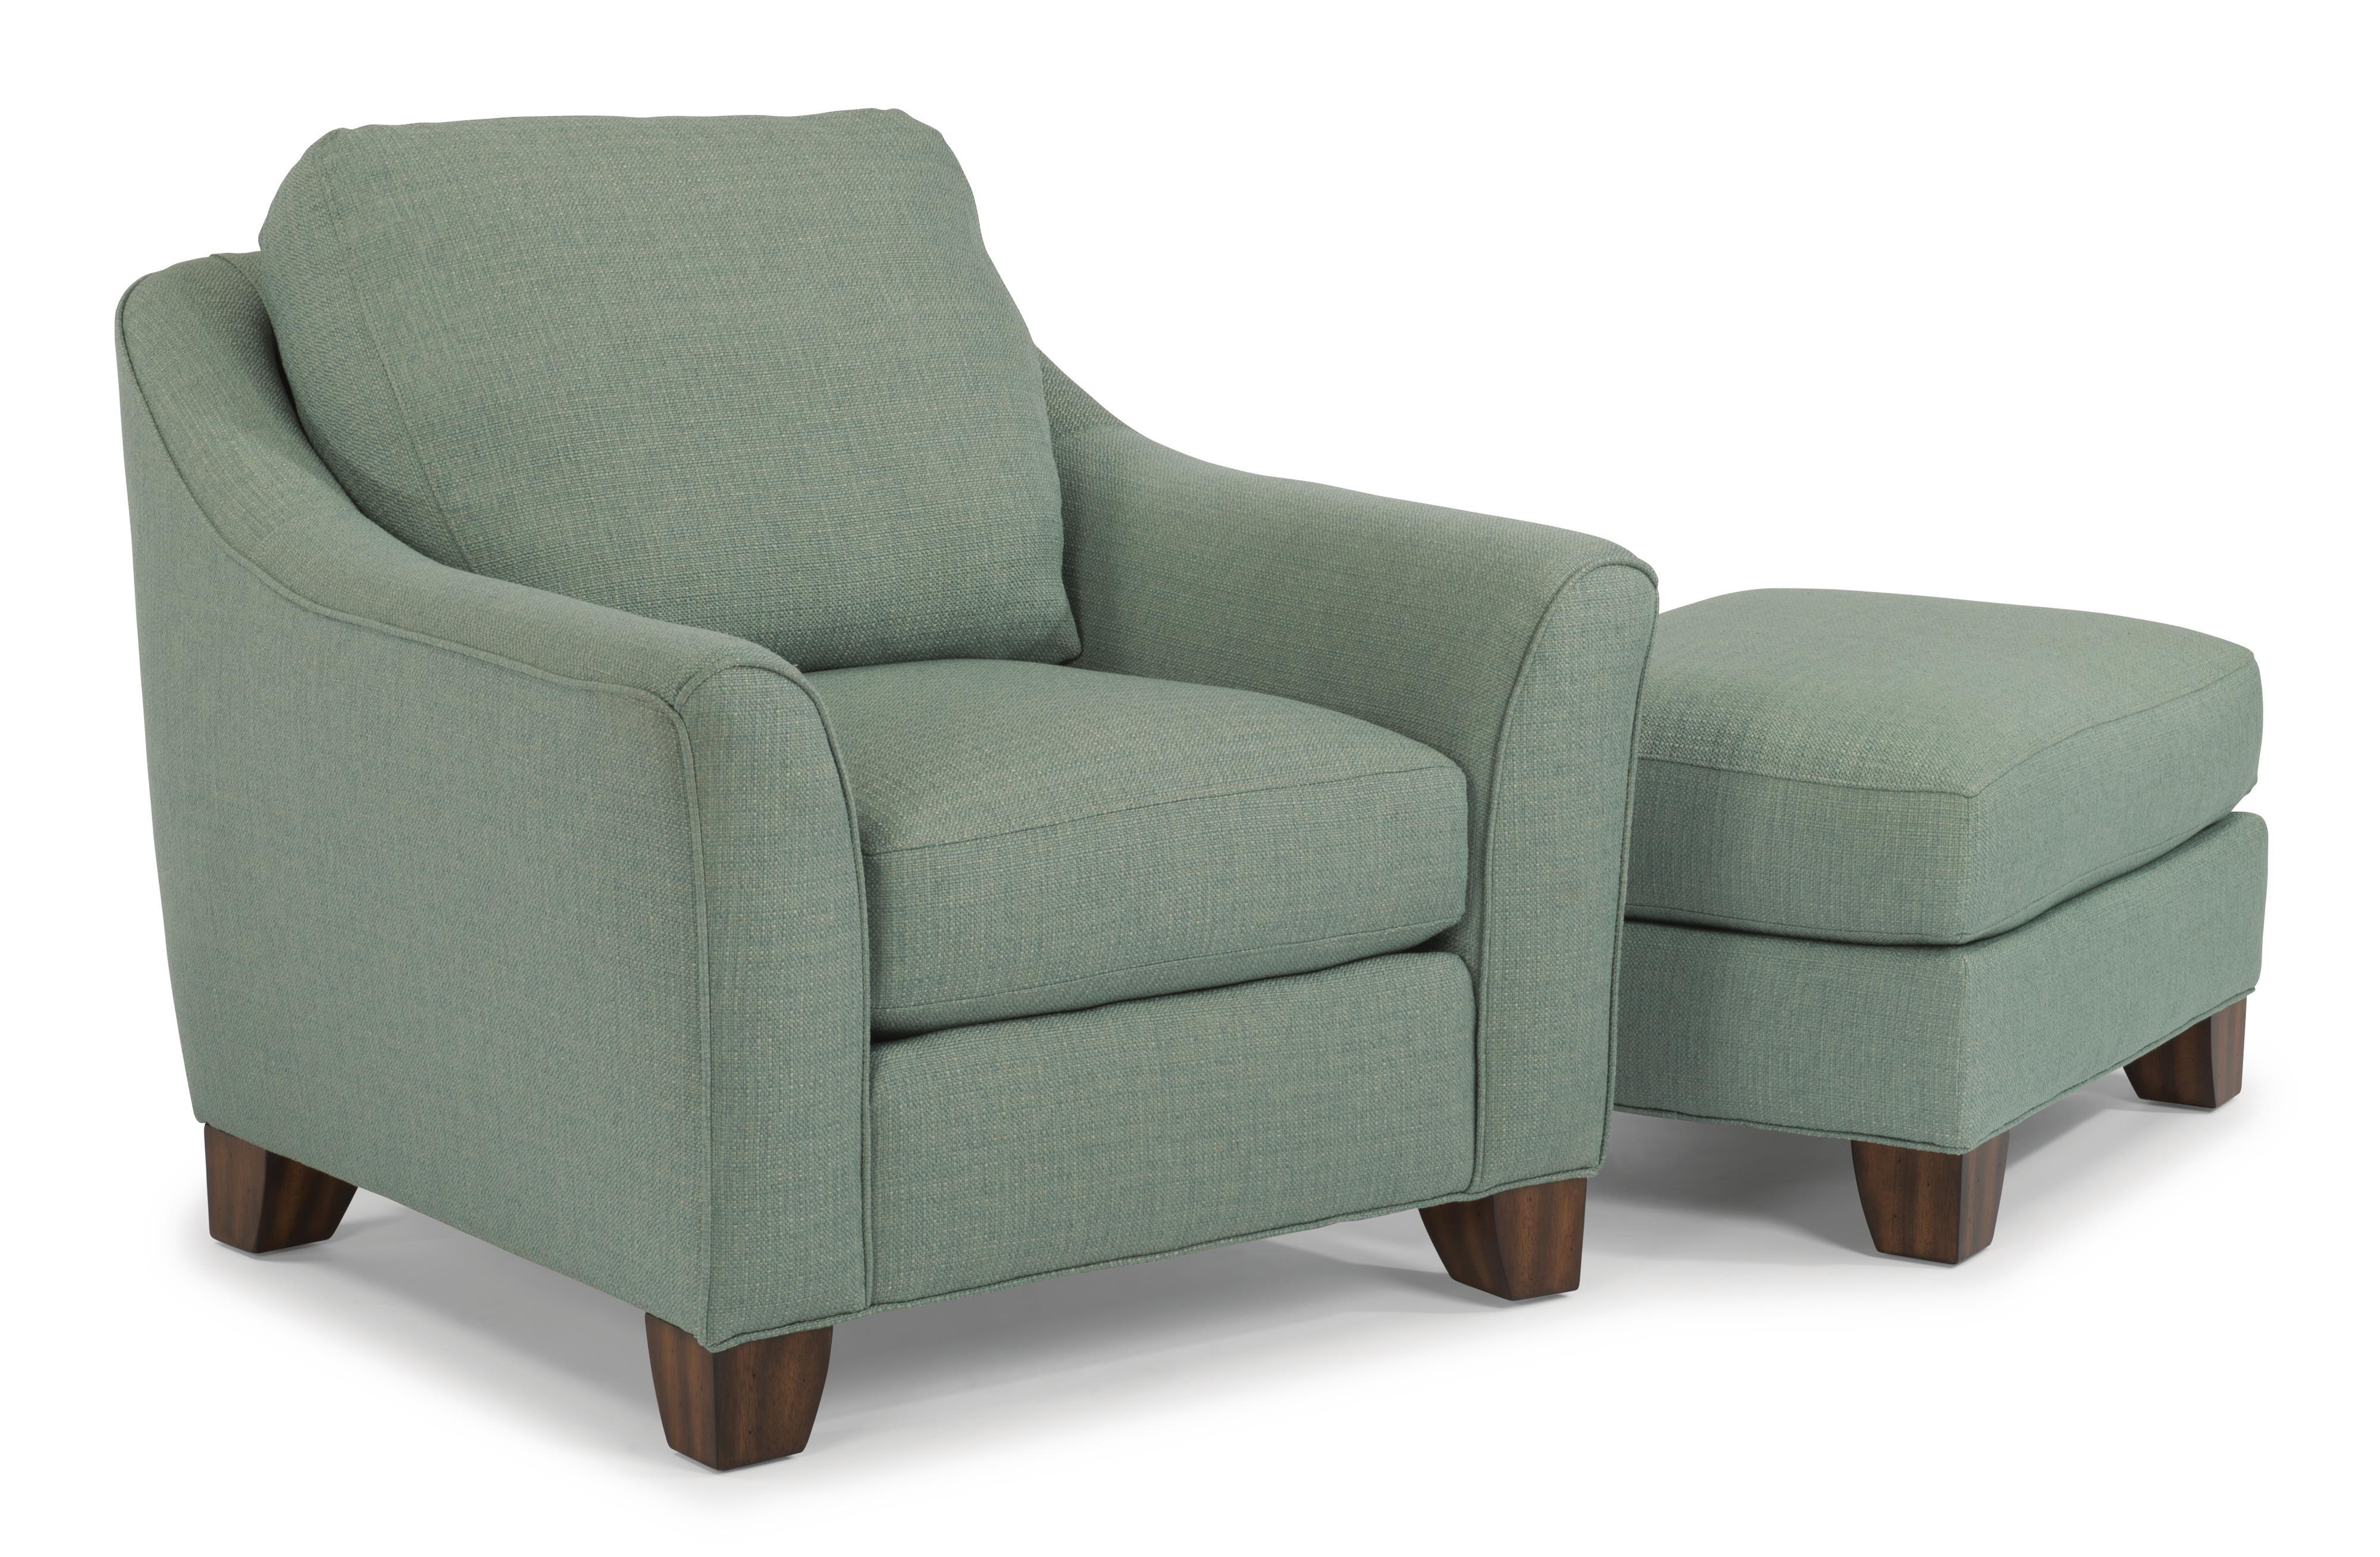 Flexsteel Claudine Chair & Ottoman Set - Item Number: 5687-10+5687-08-145-42